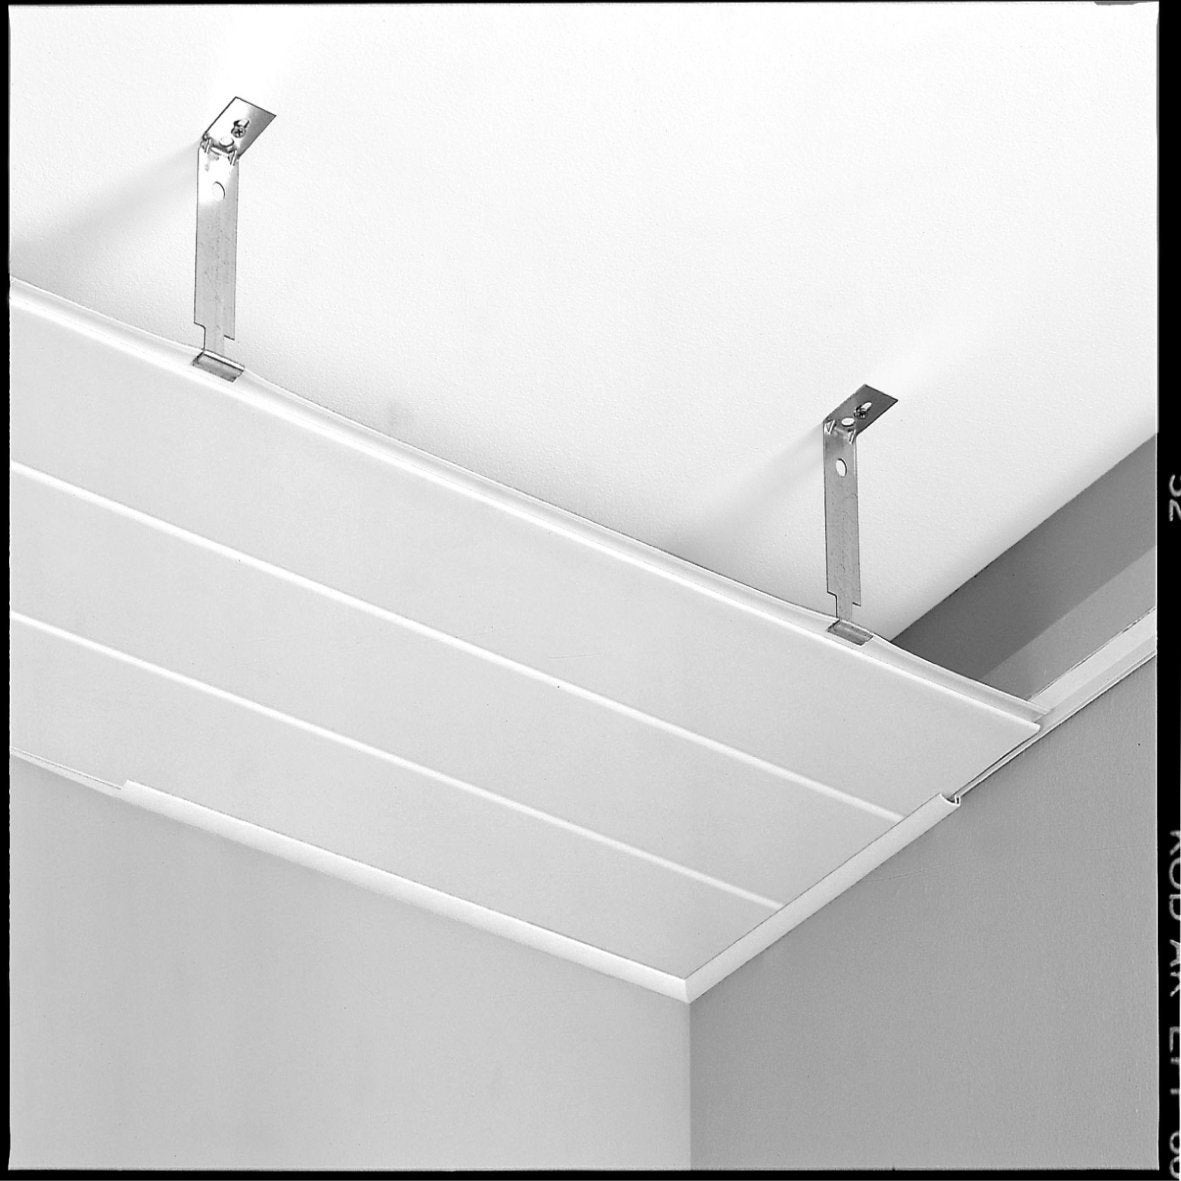 Lot De 10 Suspensions GROSFILLEX PVC, 11.6x21.5x2.7cm